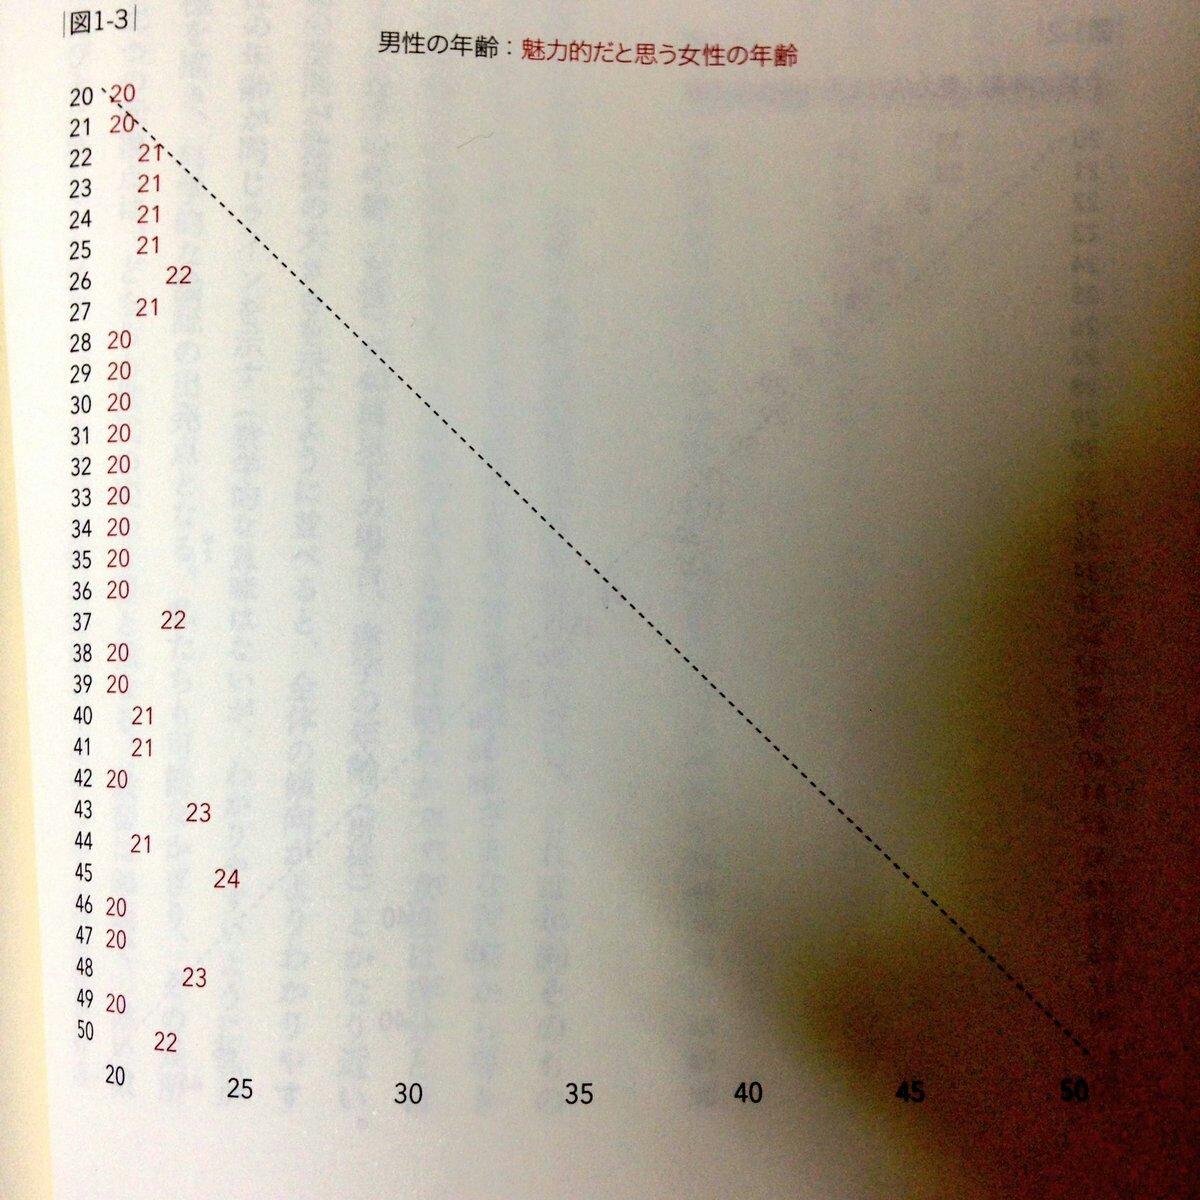 https://i1.wp.com/livedoor.blogimg.jp/news4wide/imgs/3/9/3926d7c2.jpg